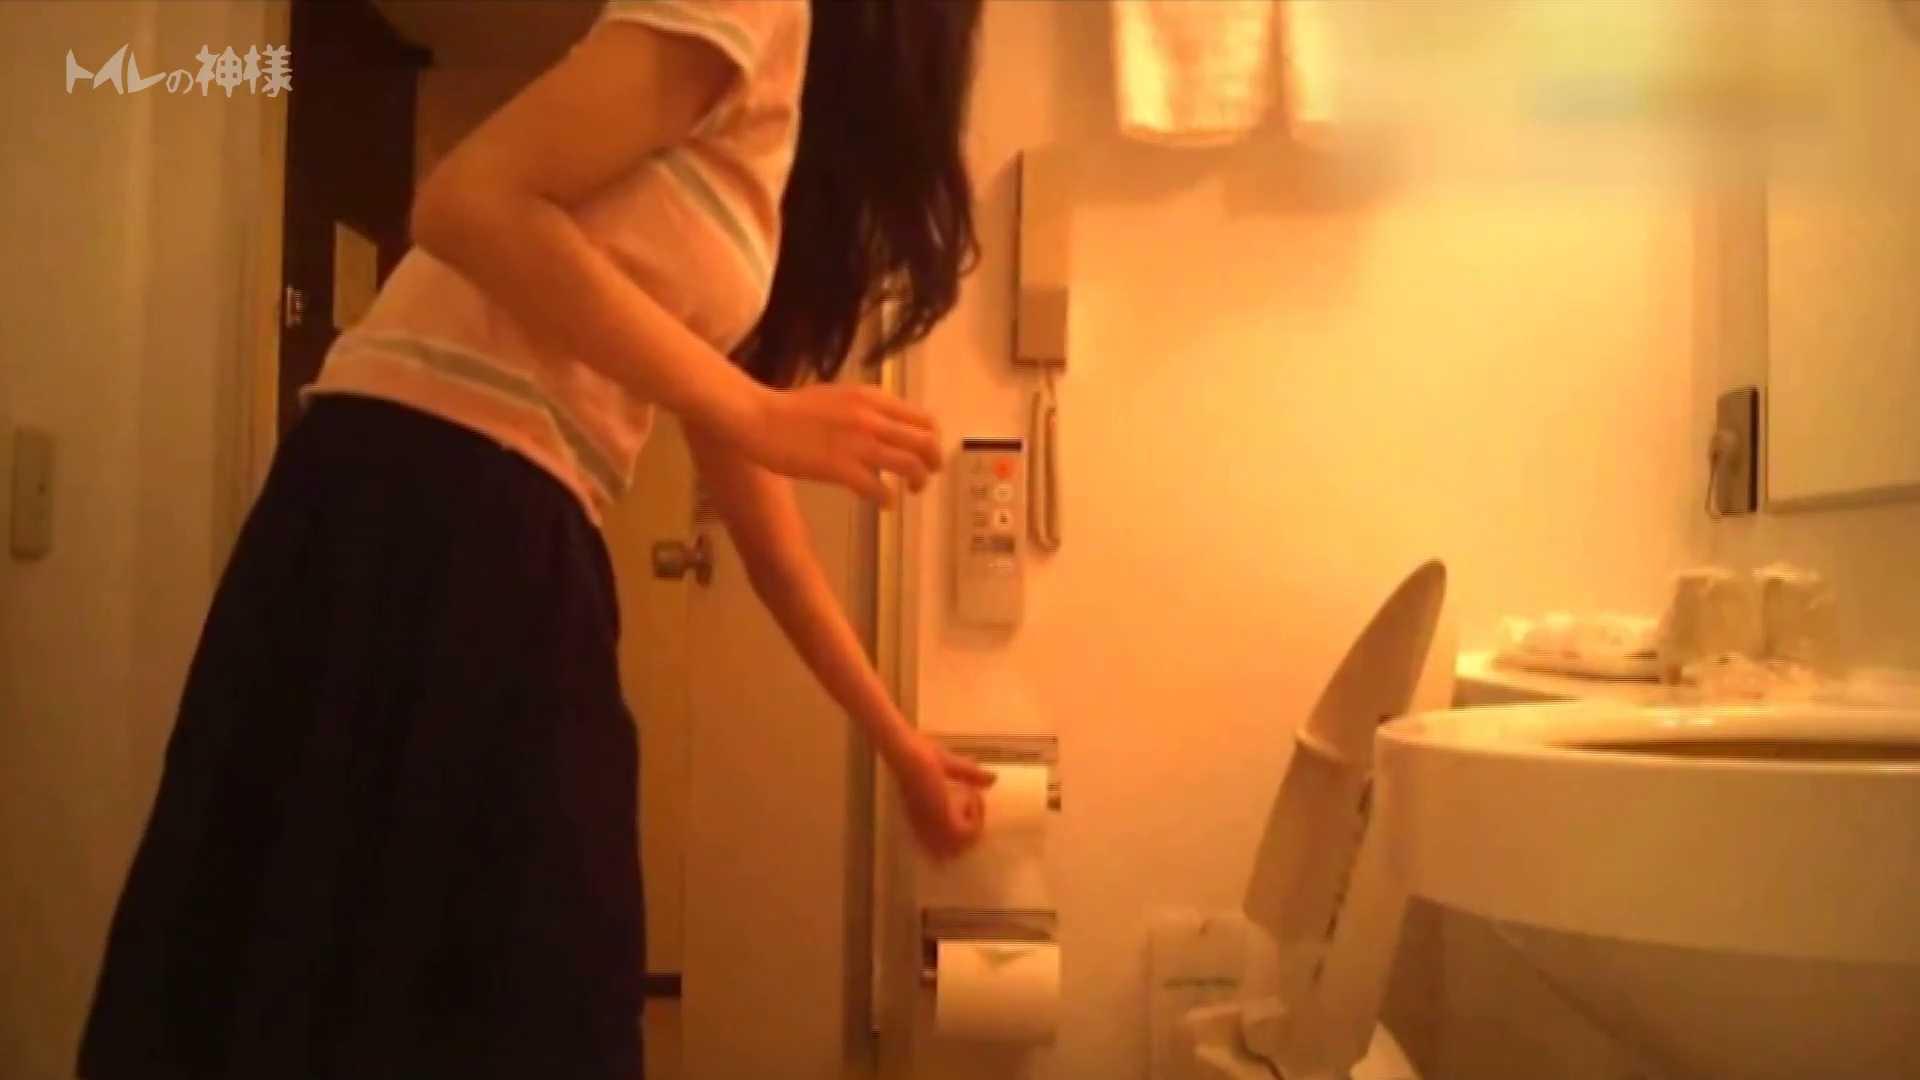 Vol.04 女子大生のトイレ恥態 トイレ盗撮 | 丸見え  92枚 31